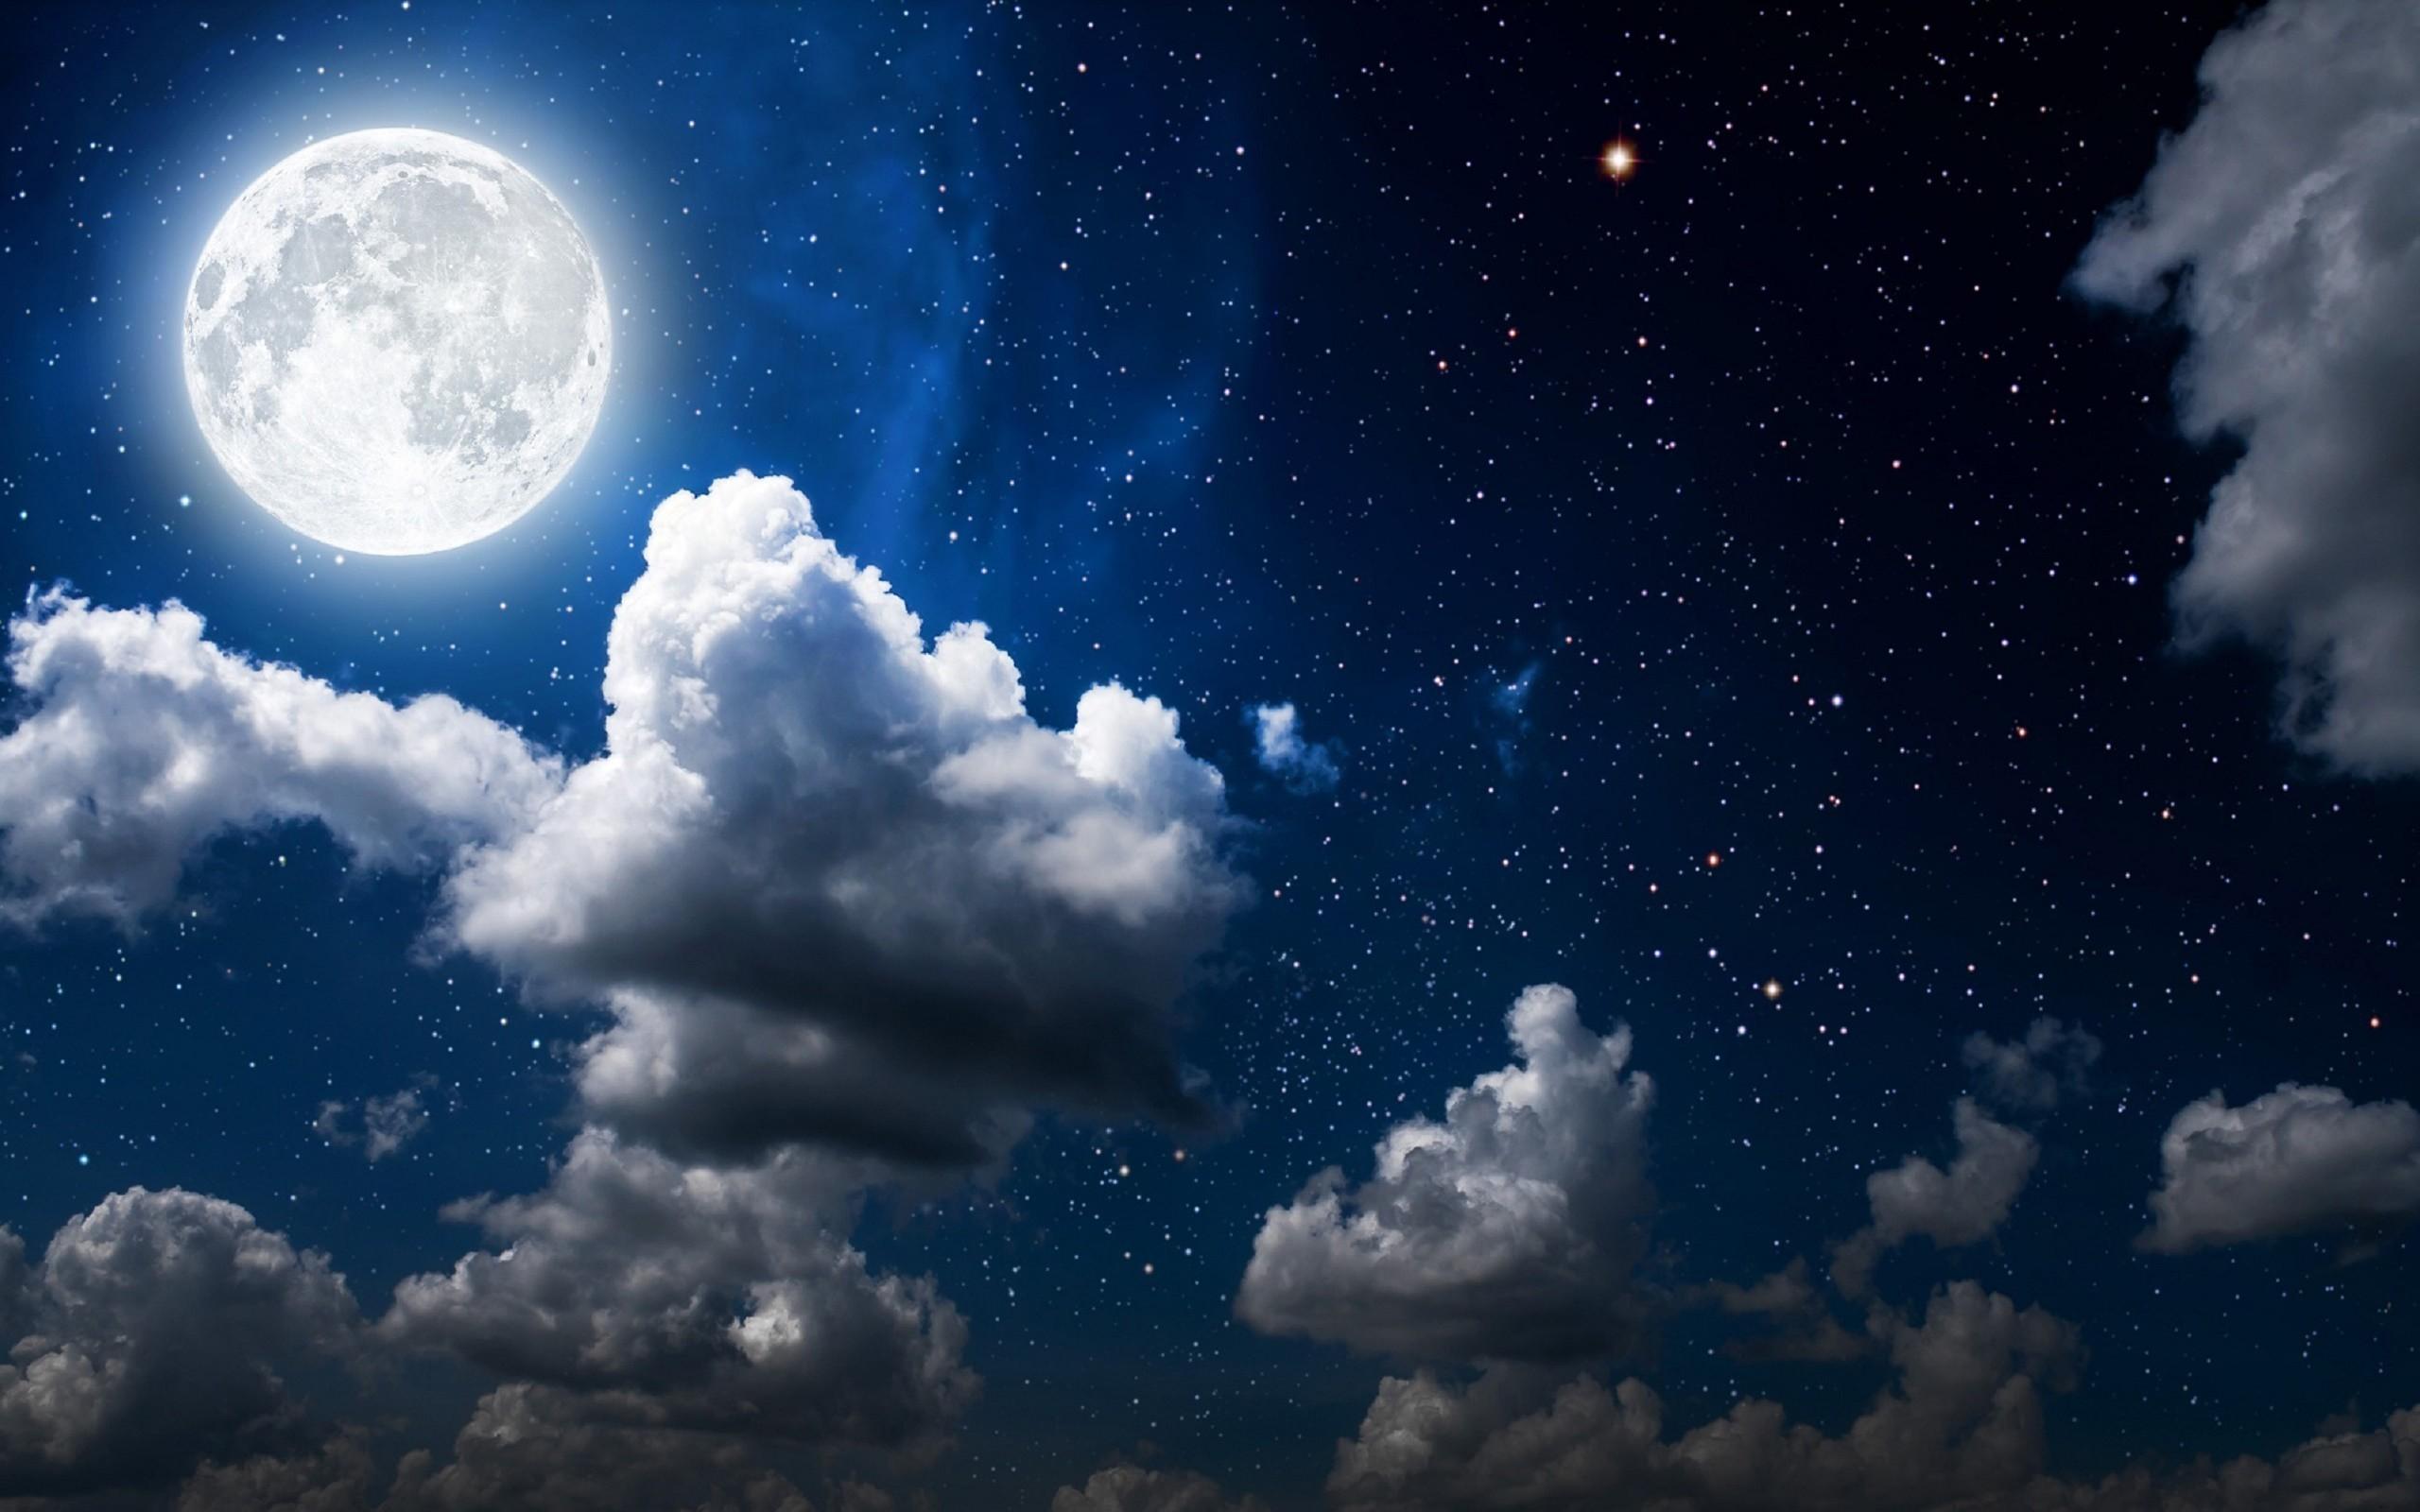 Creative Fall Wallpaper Moon Clouds Dark Sky Wallpapers Hd Wallpapers Id 18374